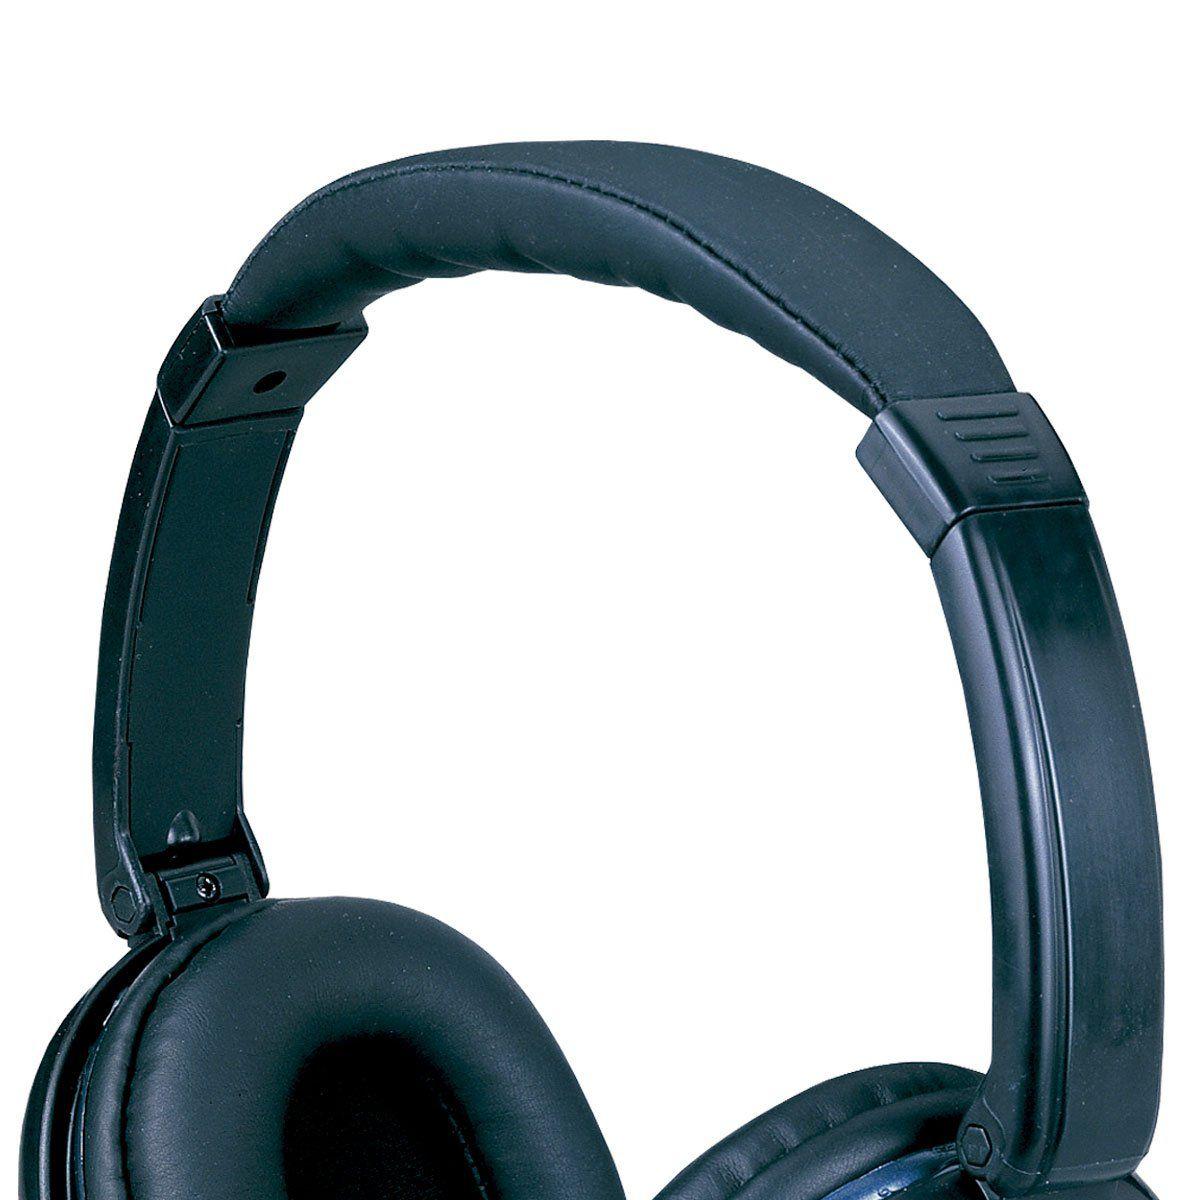 Fone de Ouvido Overear p/ DJ 20Hz - 20KHz 32 Ohms Driver de Neodimio - CD 85 Yoga